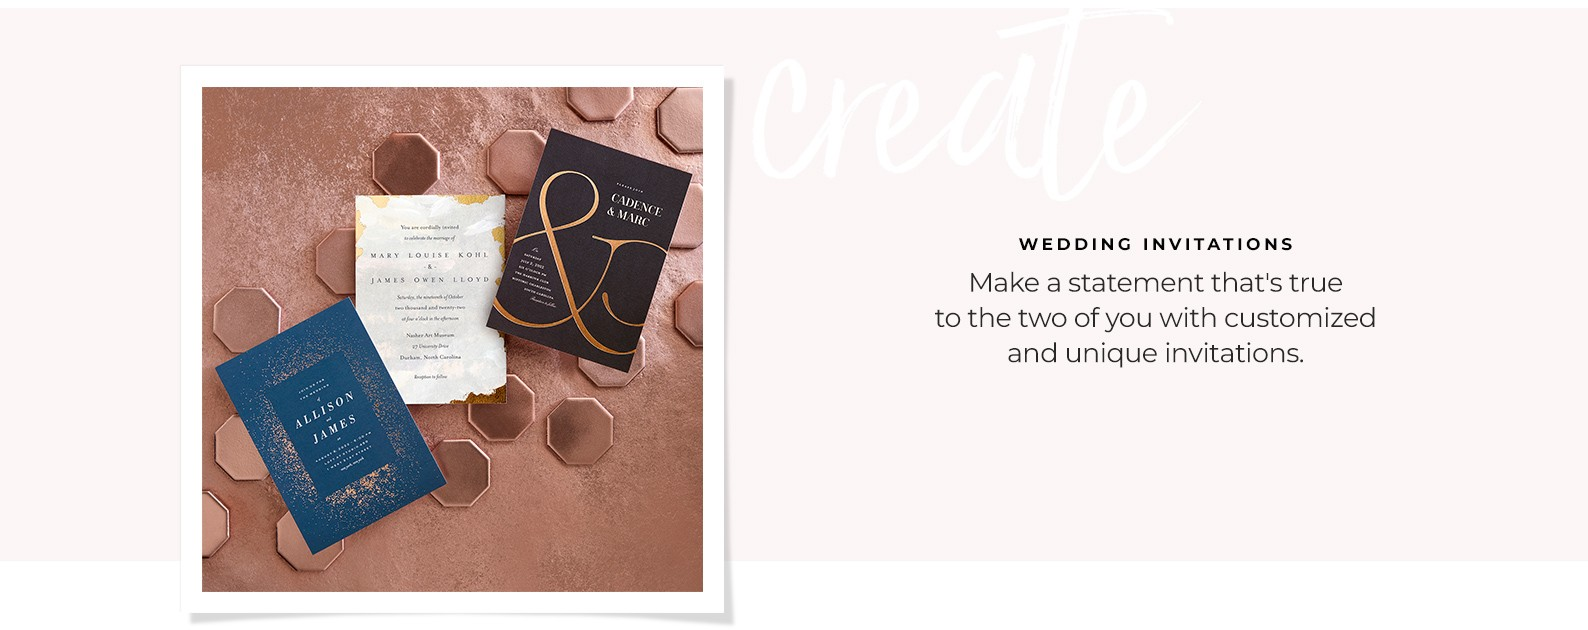 the wedding shop shutterfly